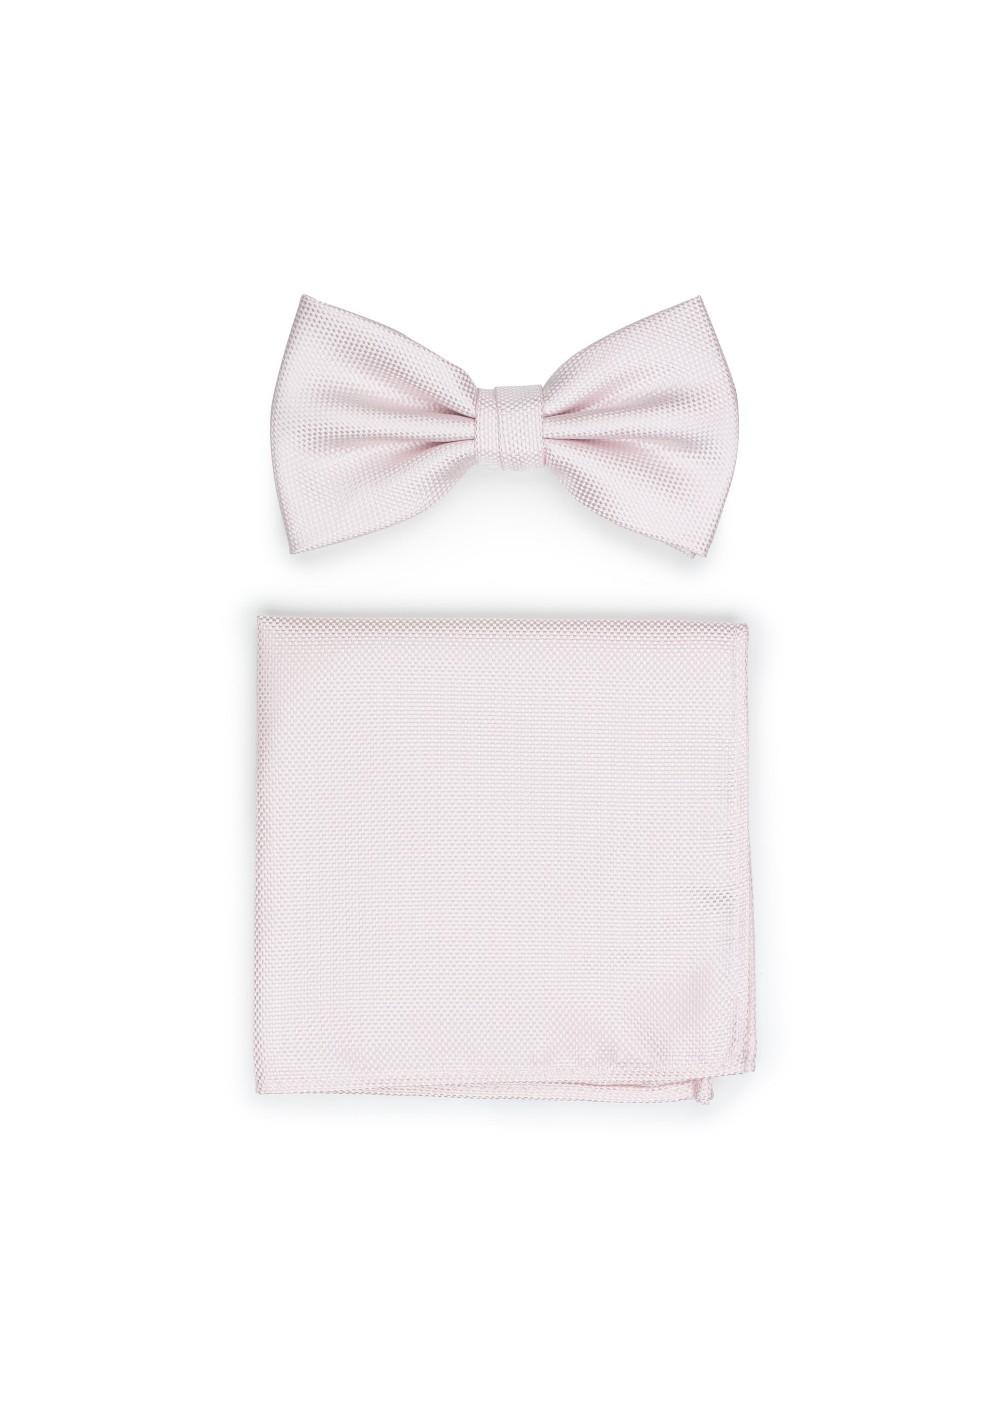 Bridal Blush Bowtie Set